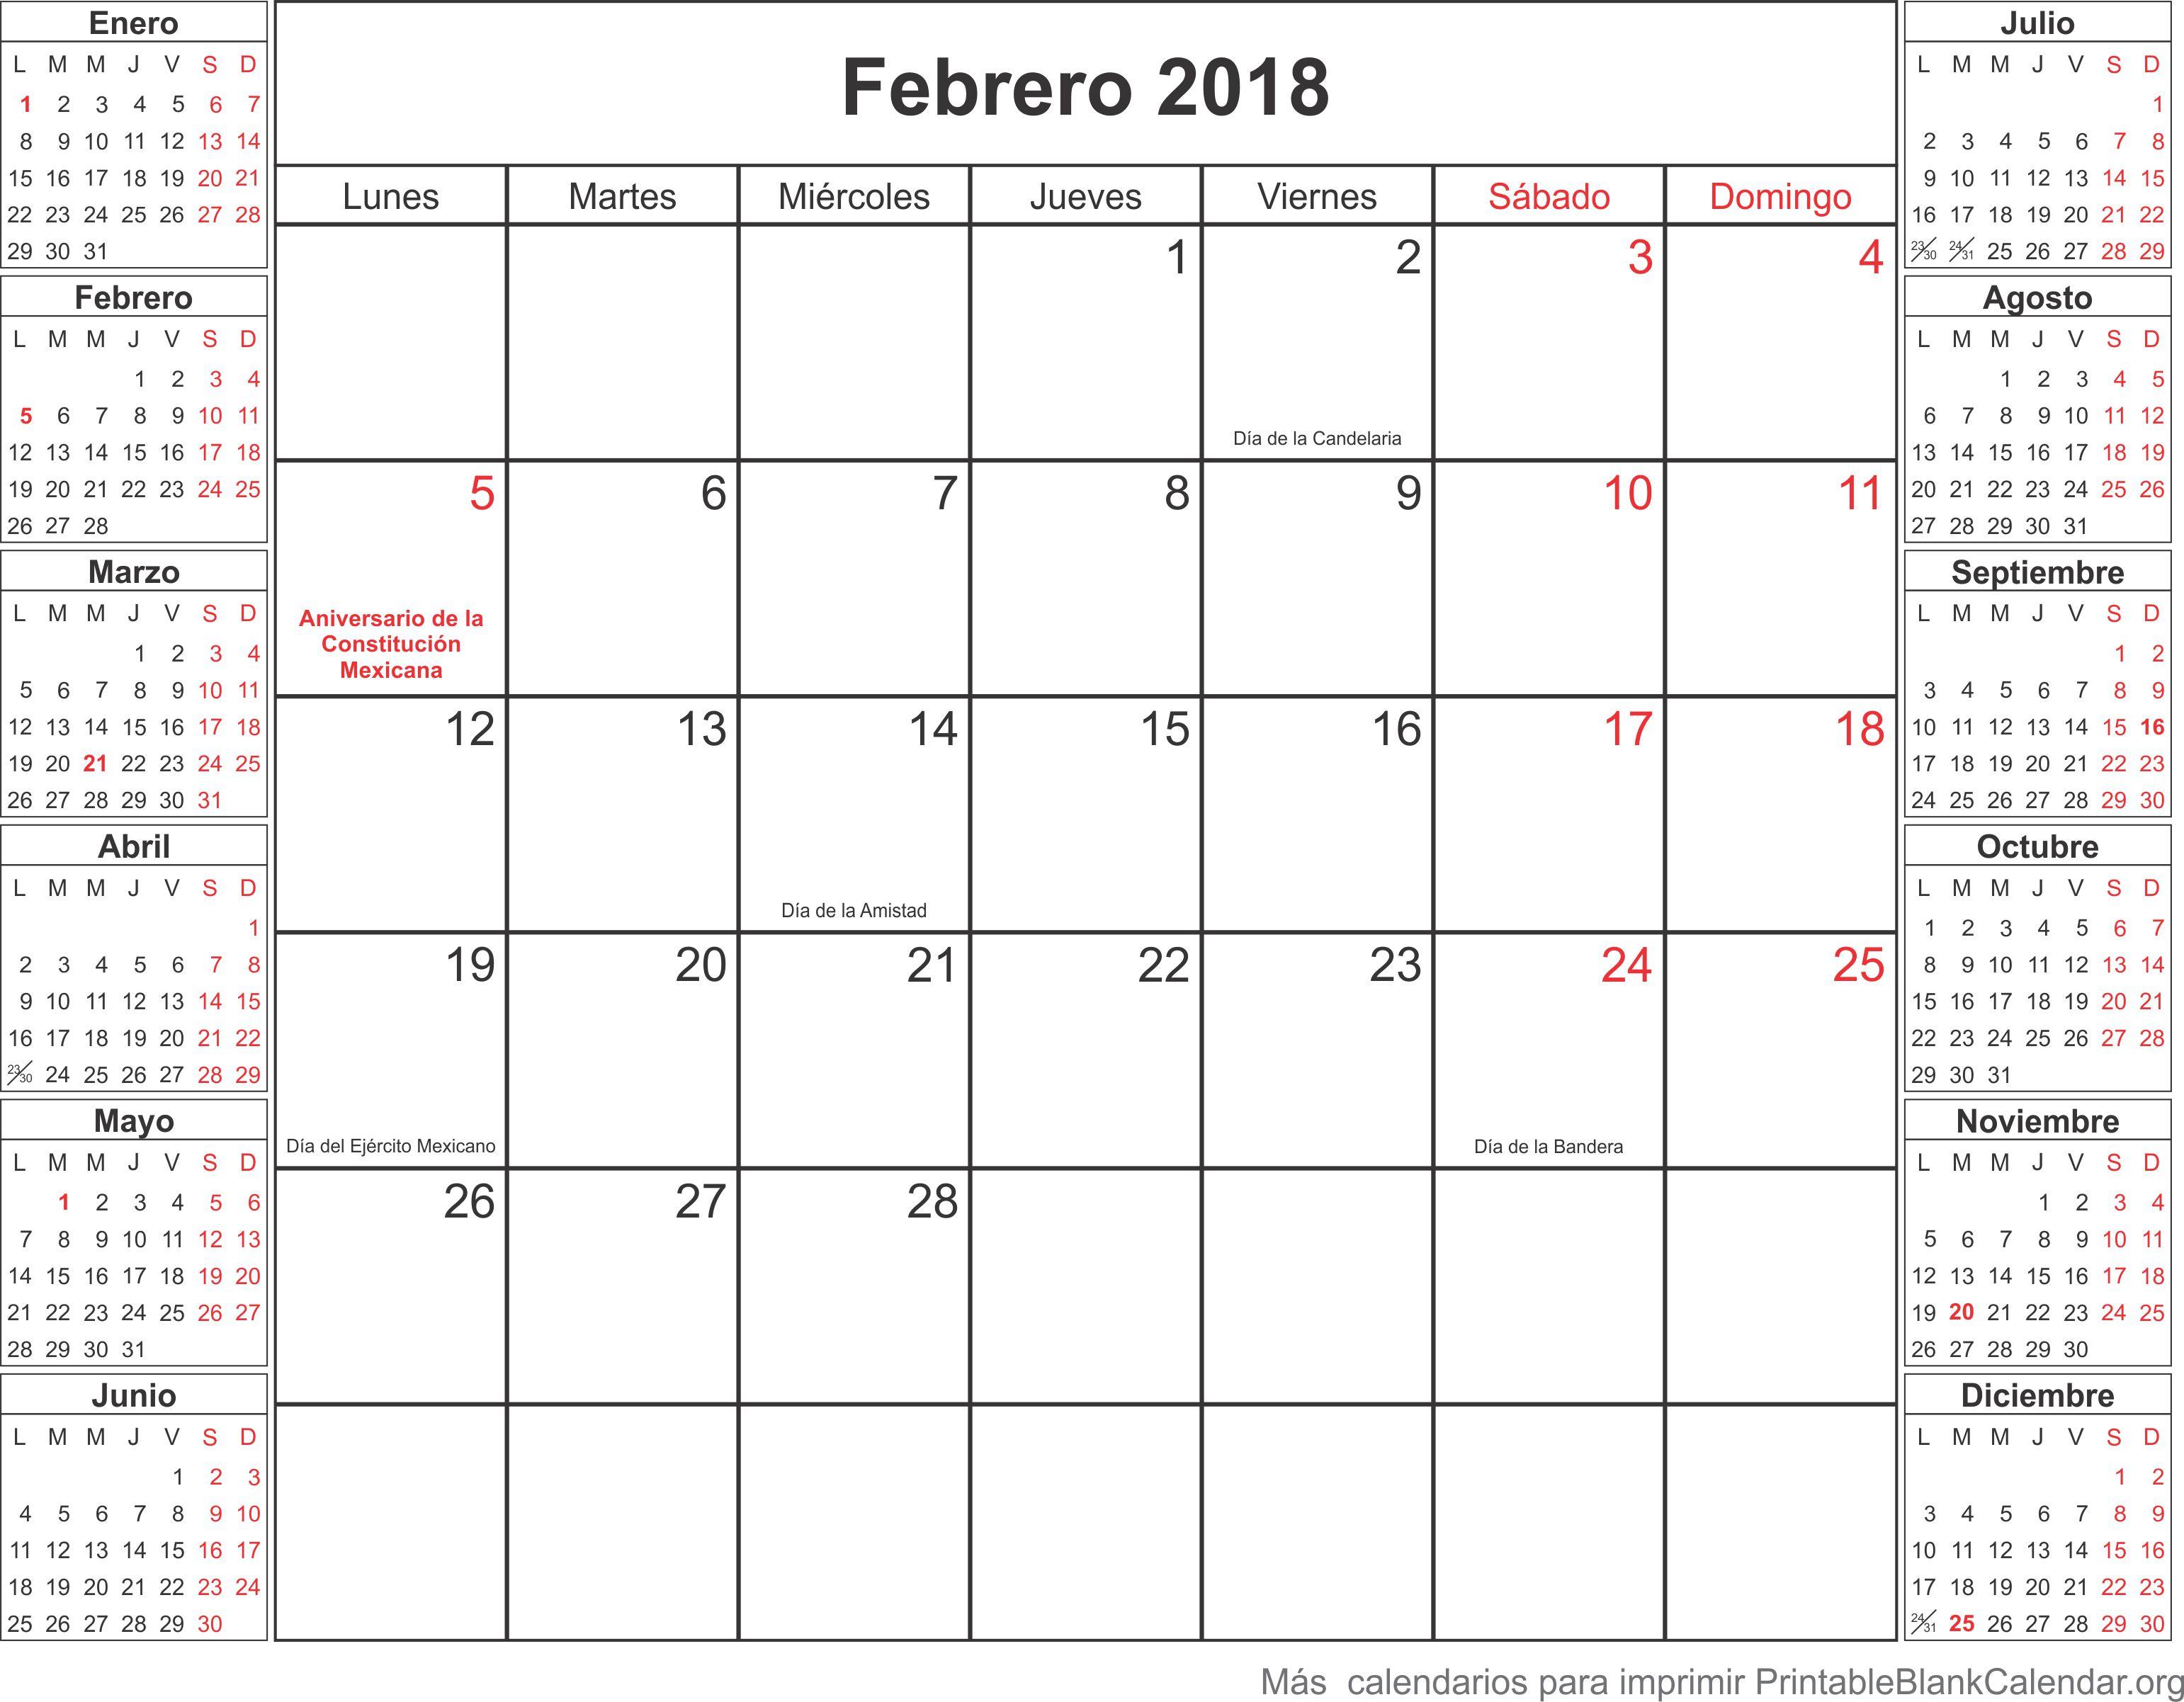 calendario para imprimir febrero 2018